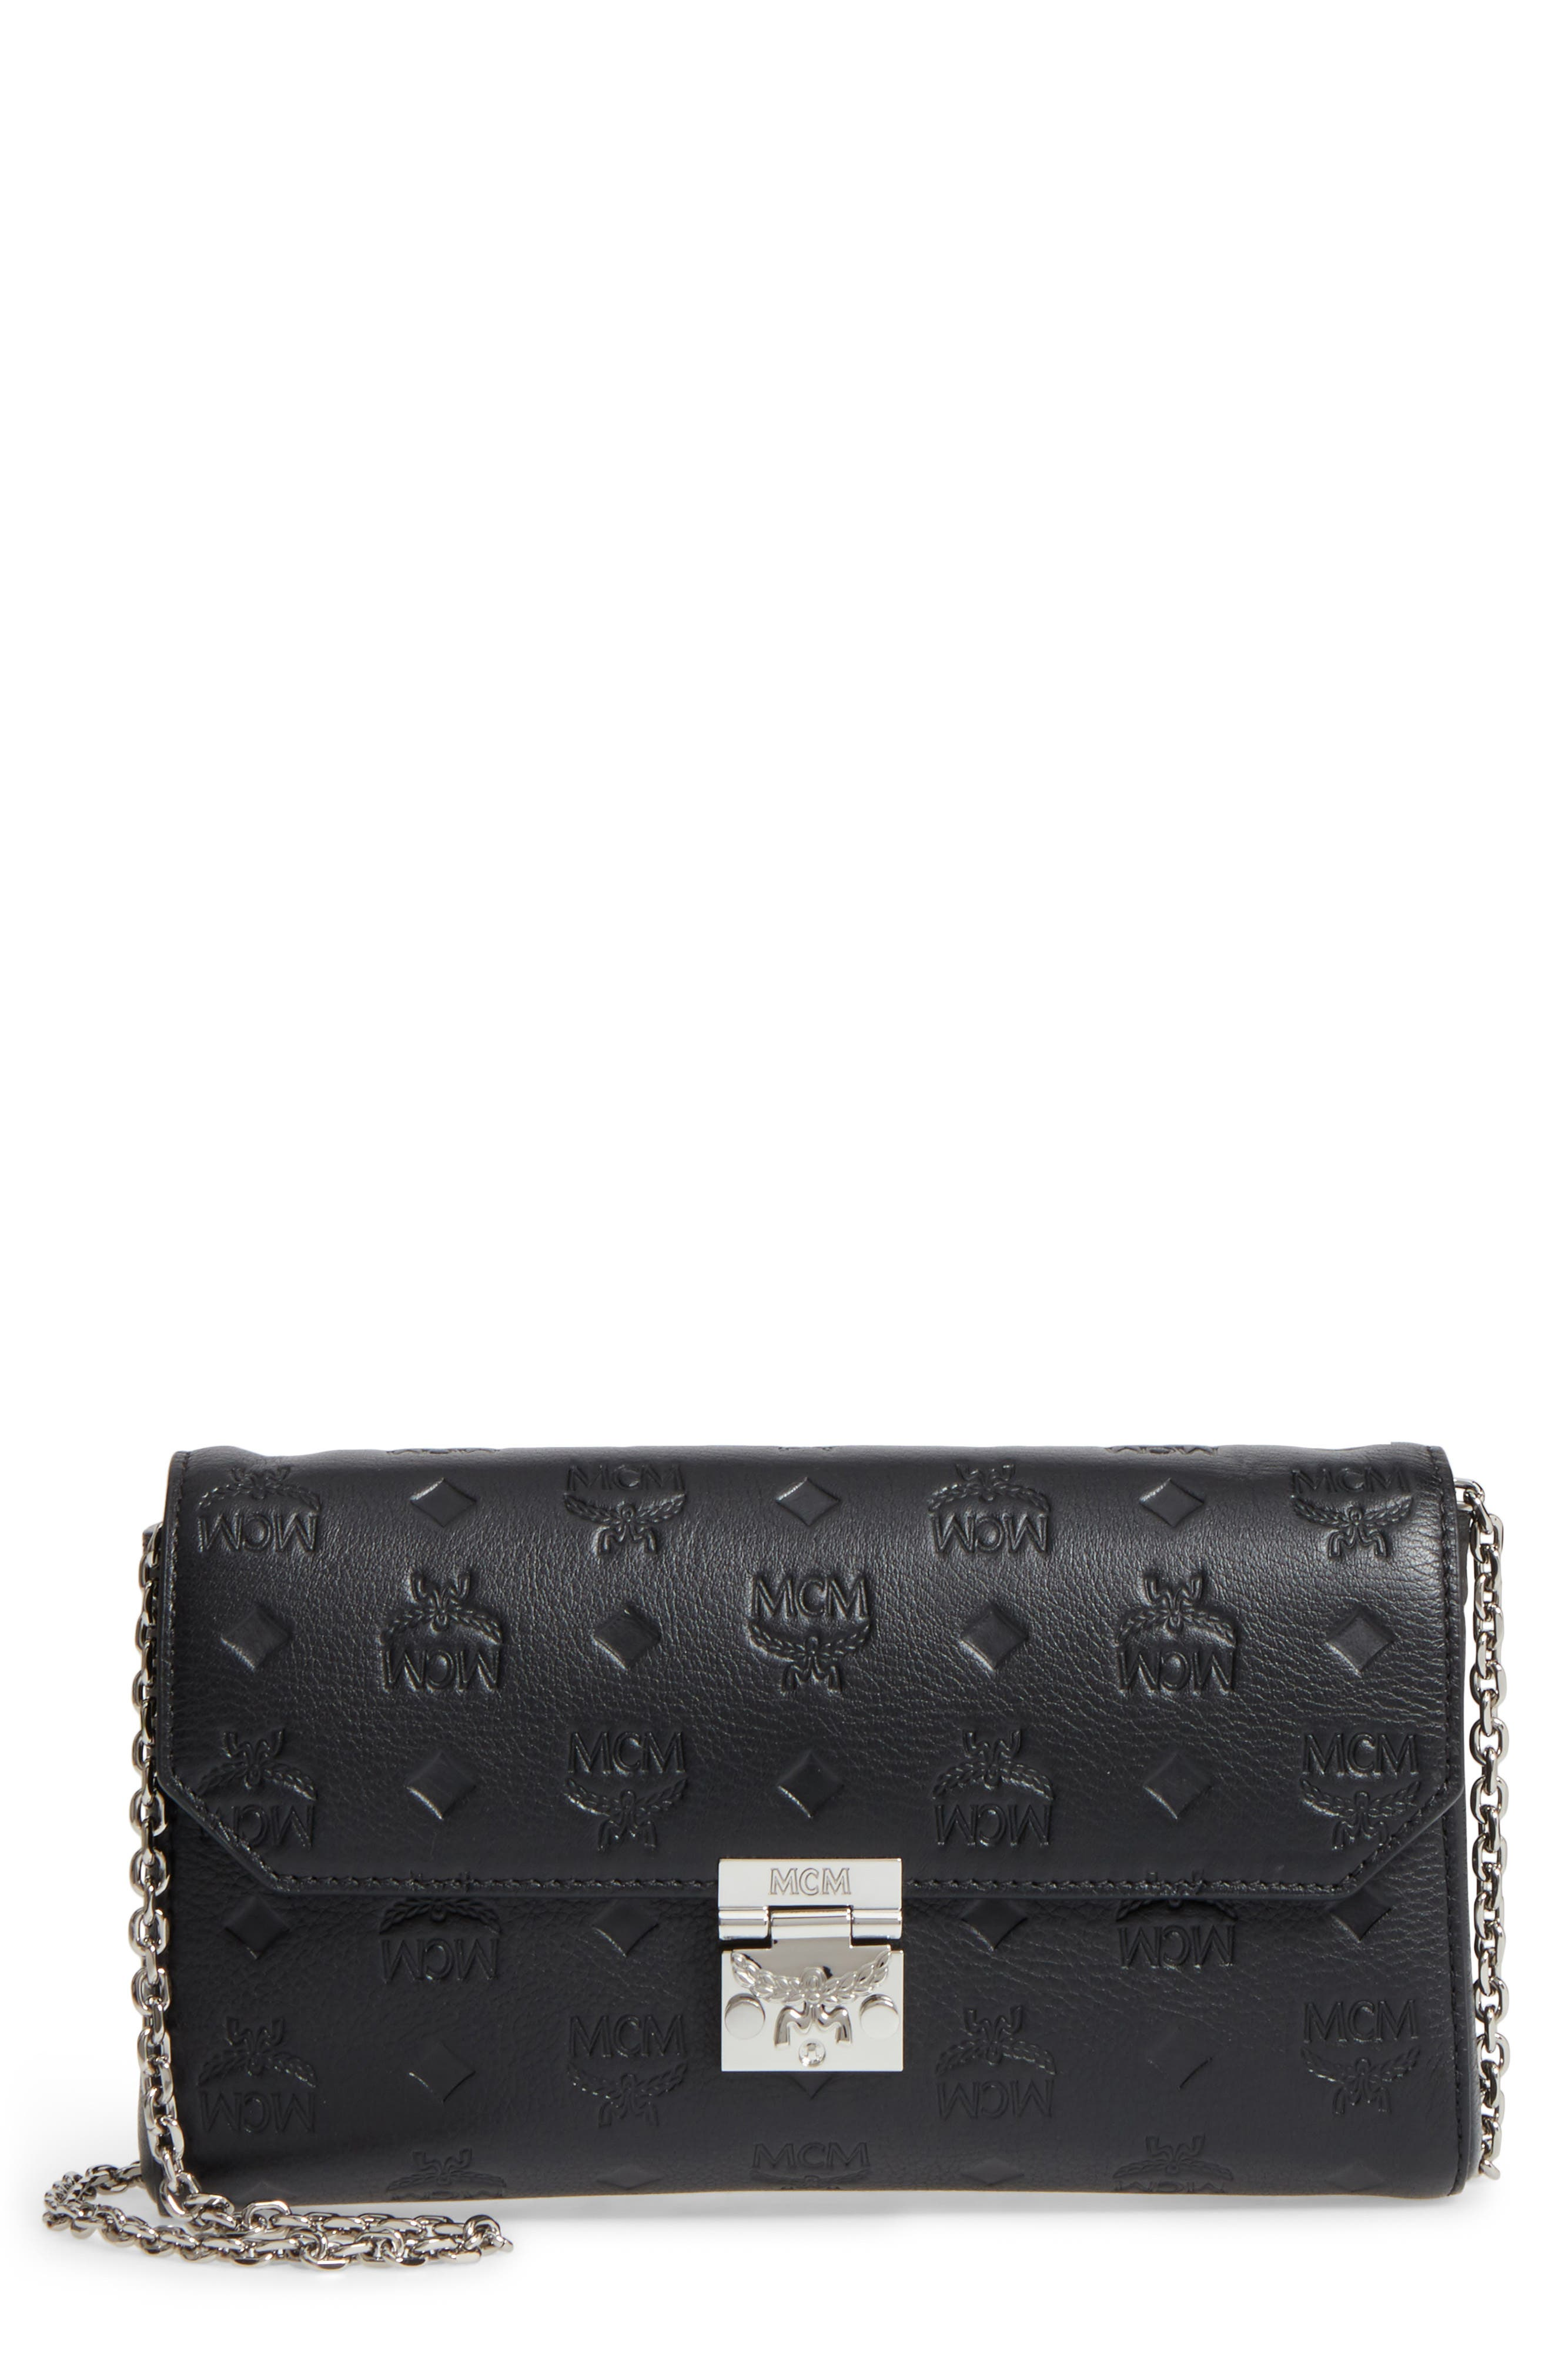 MCM Millie Leather Crossbody Bag